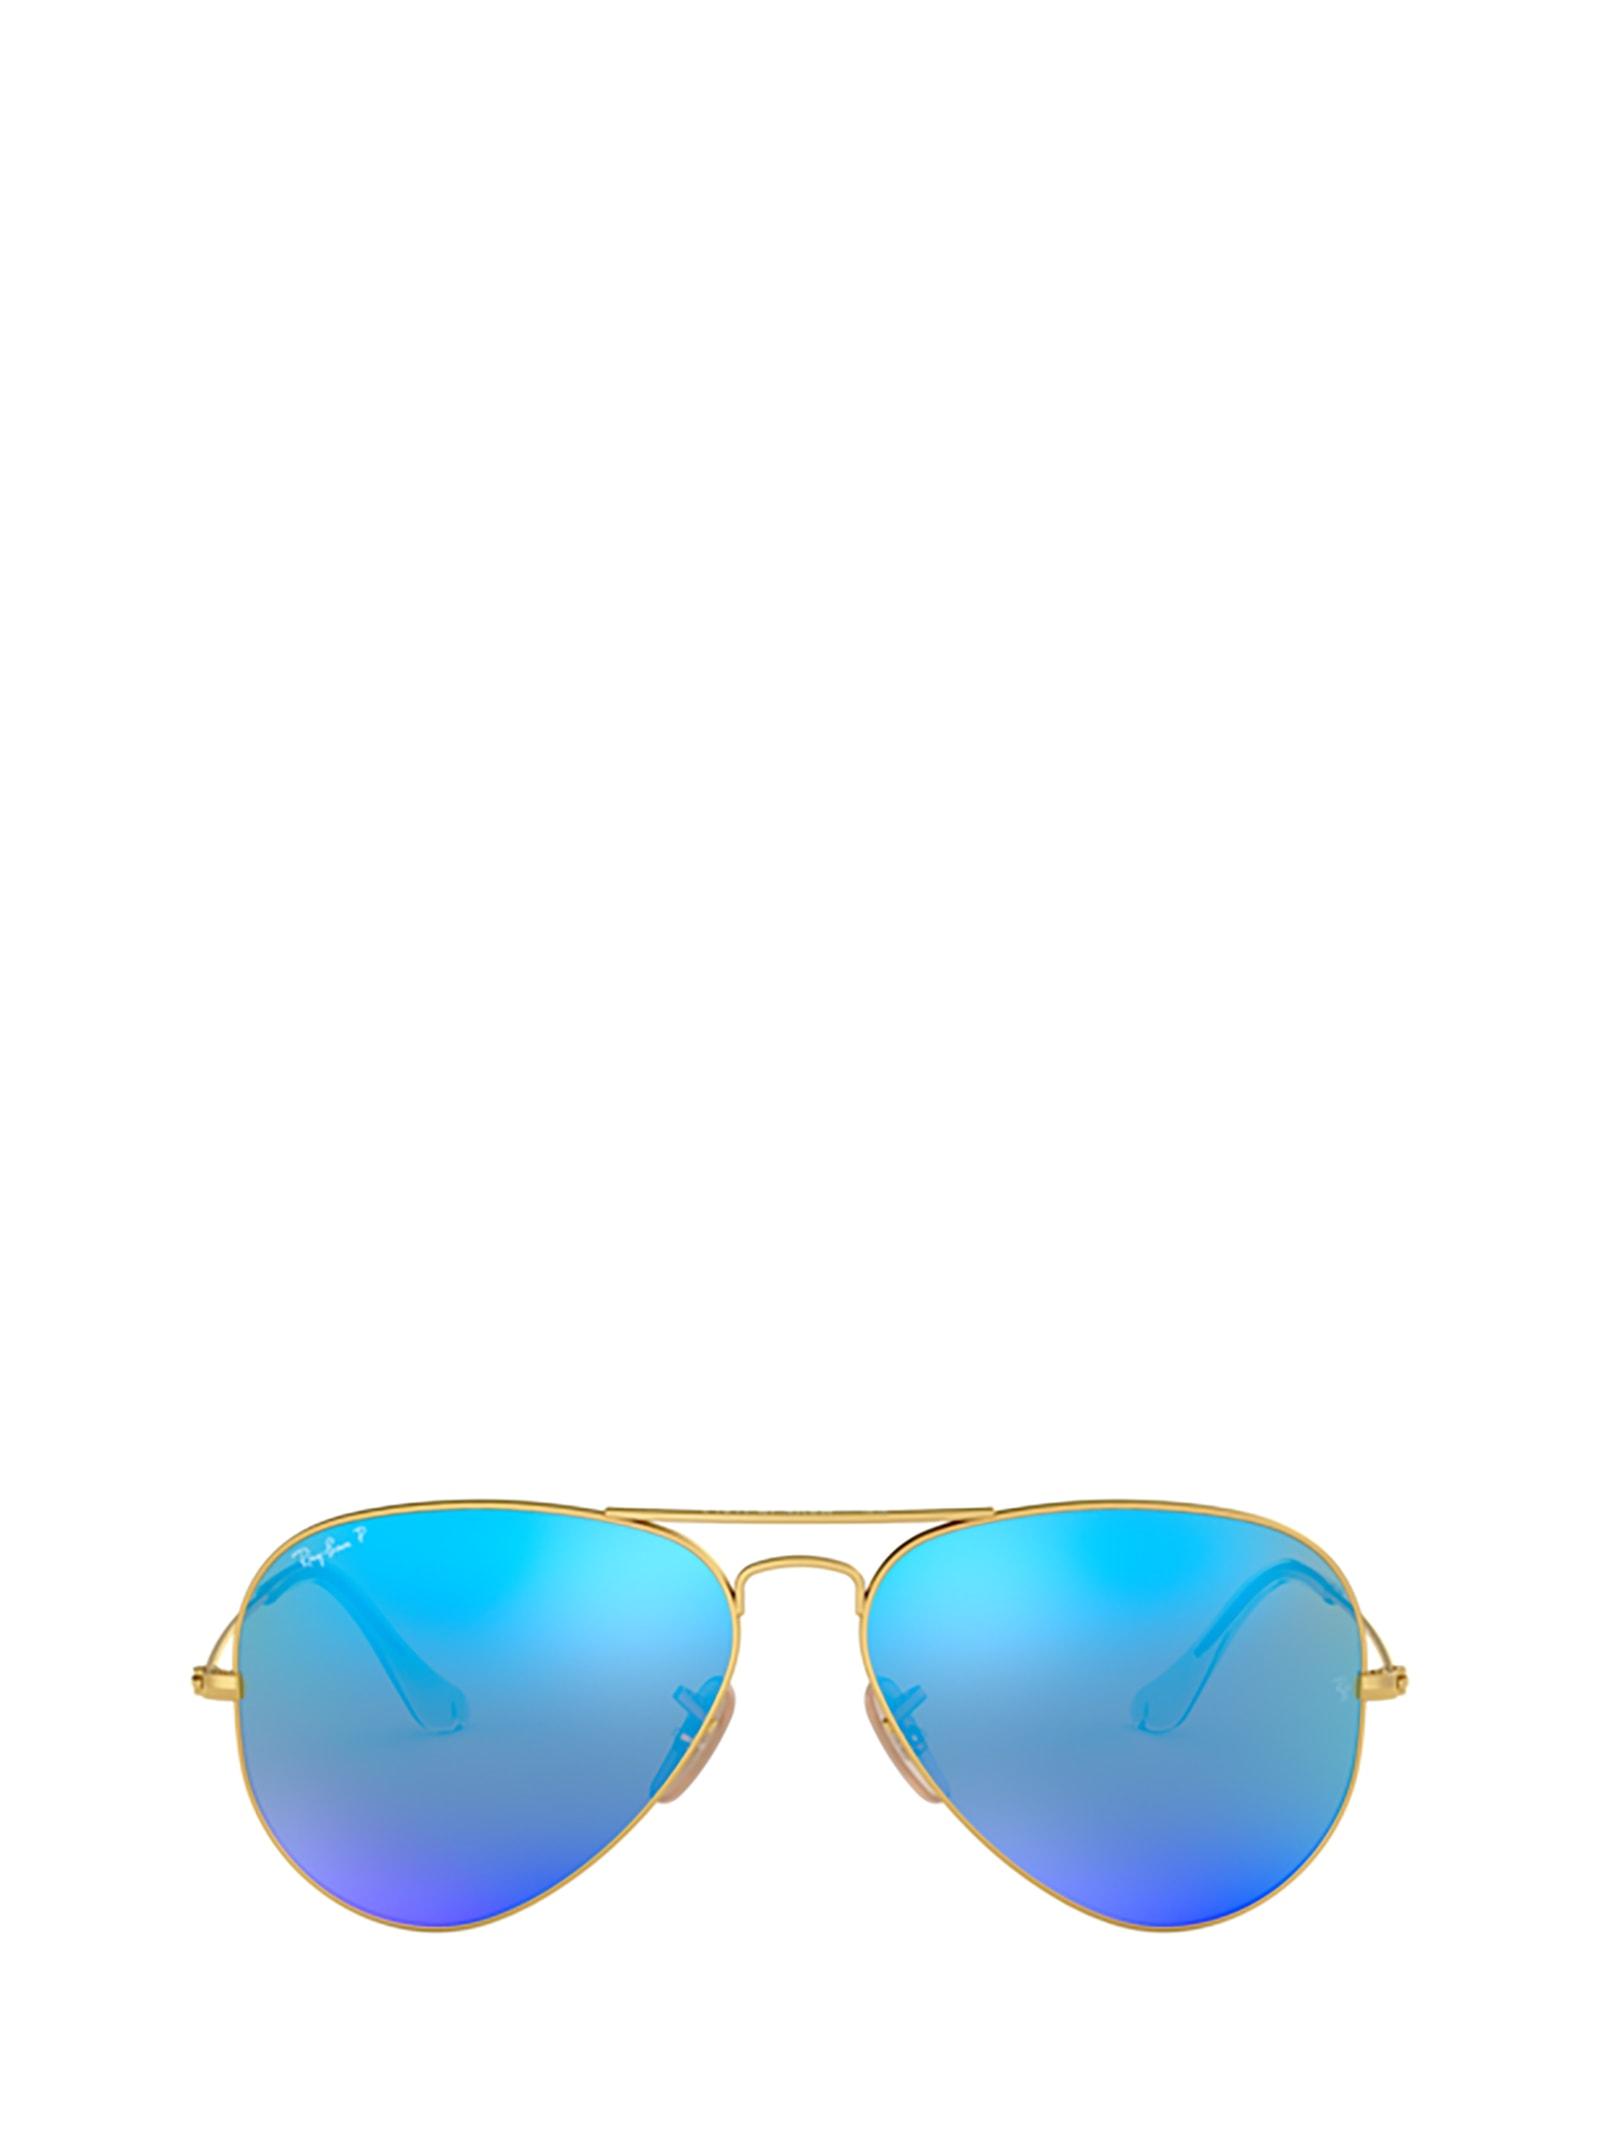 Ray-Ban Ray-ban Rb3025 Matte Arista Sunglasses